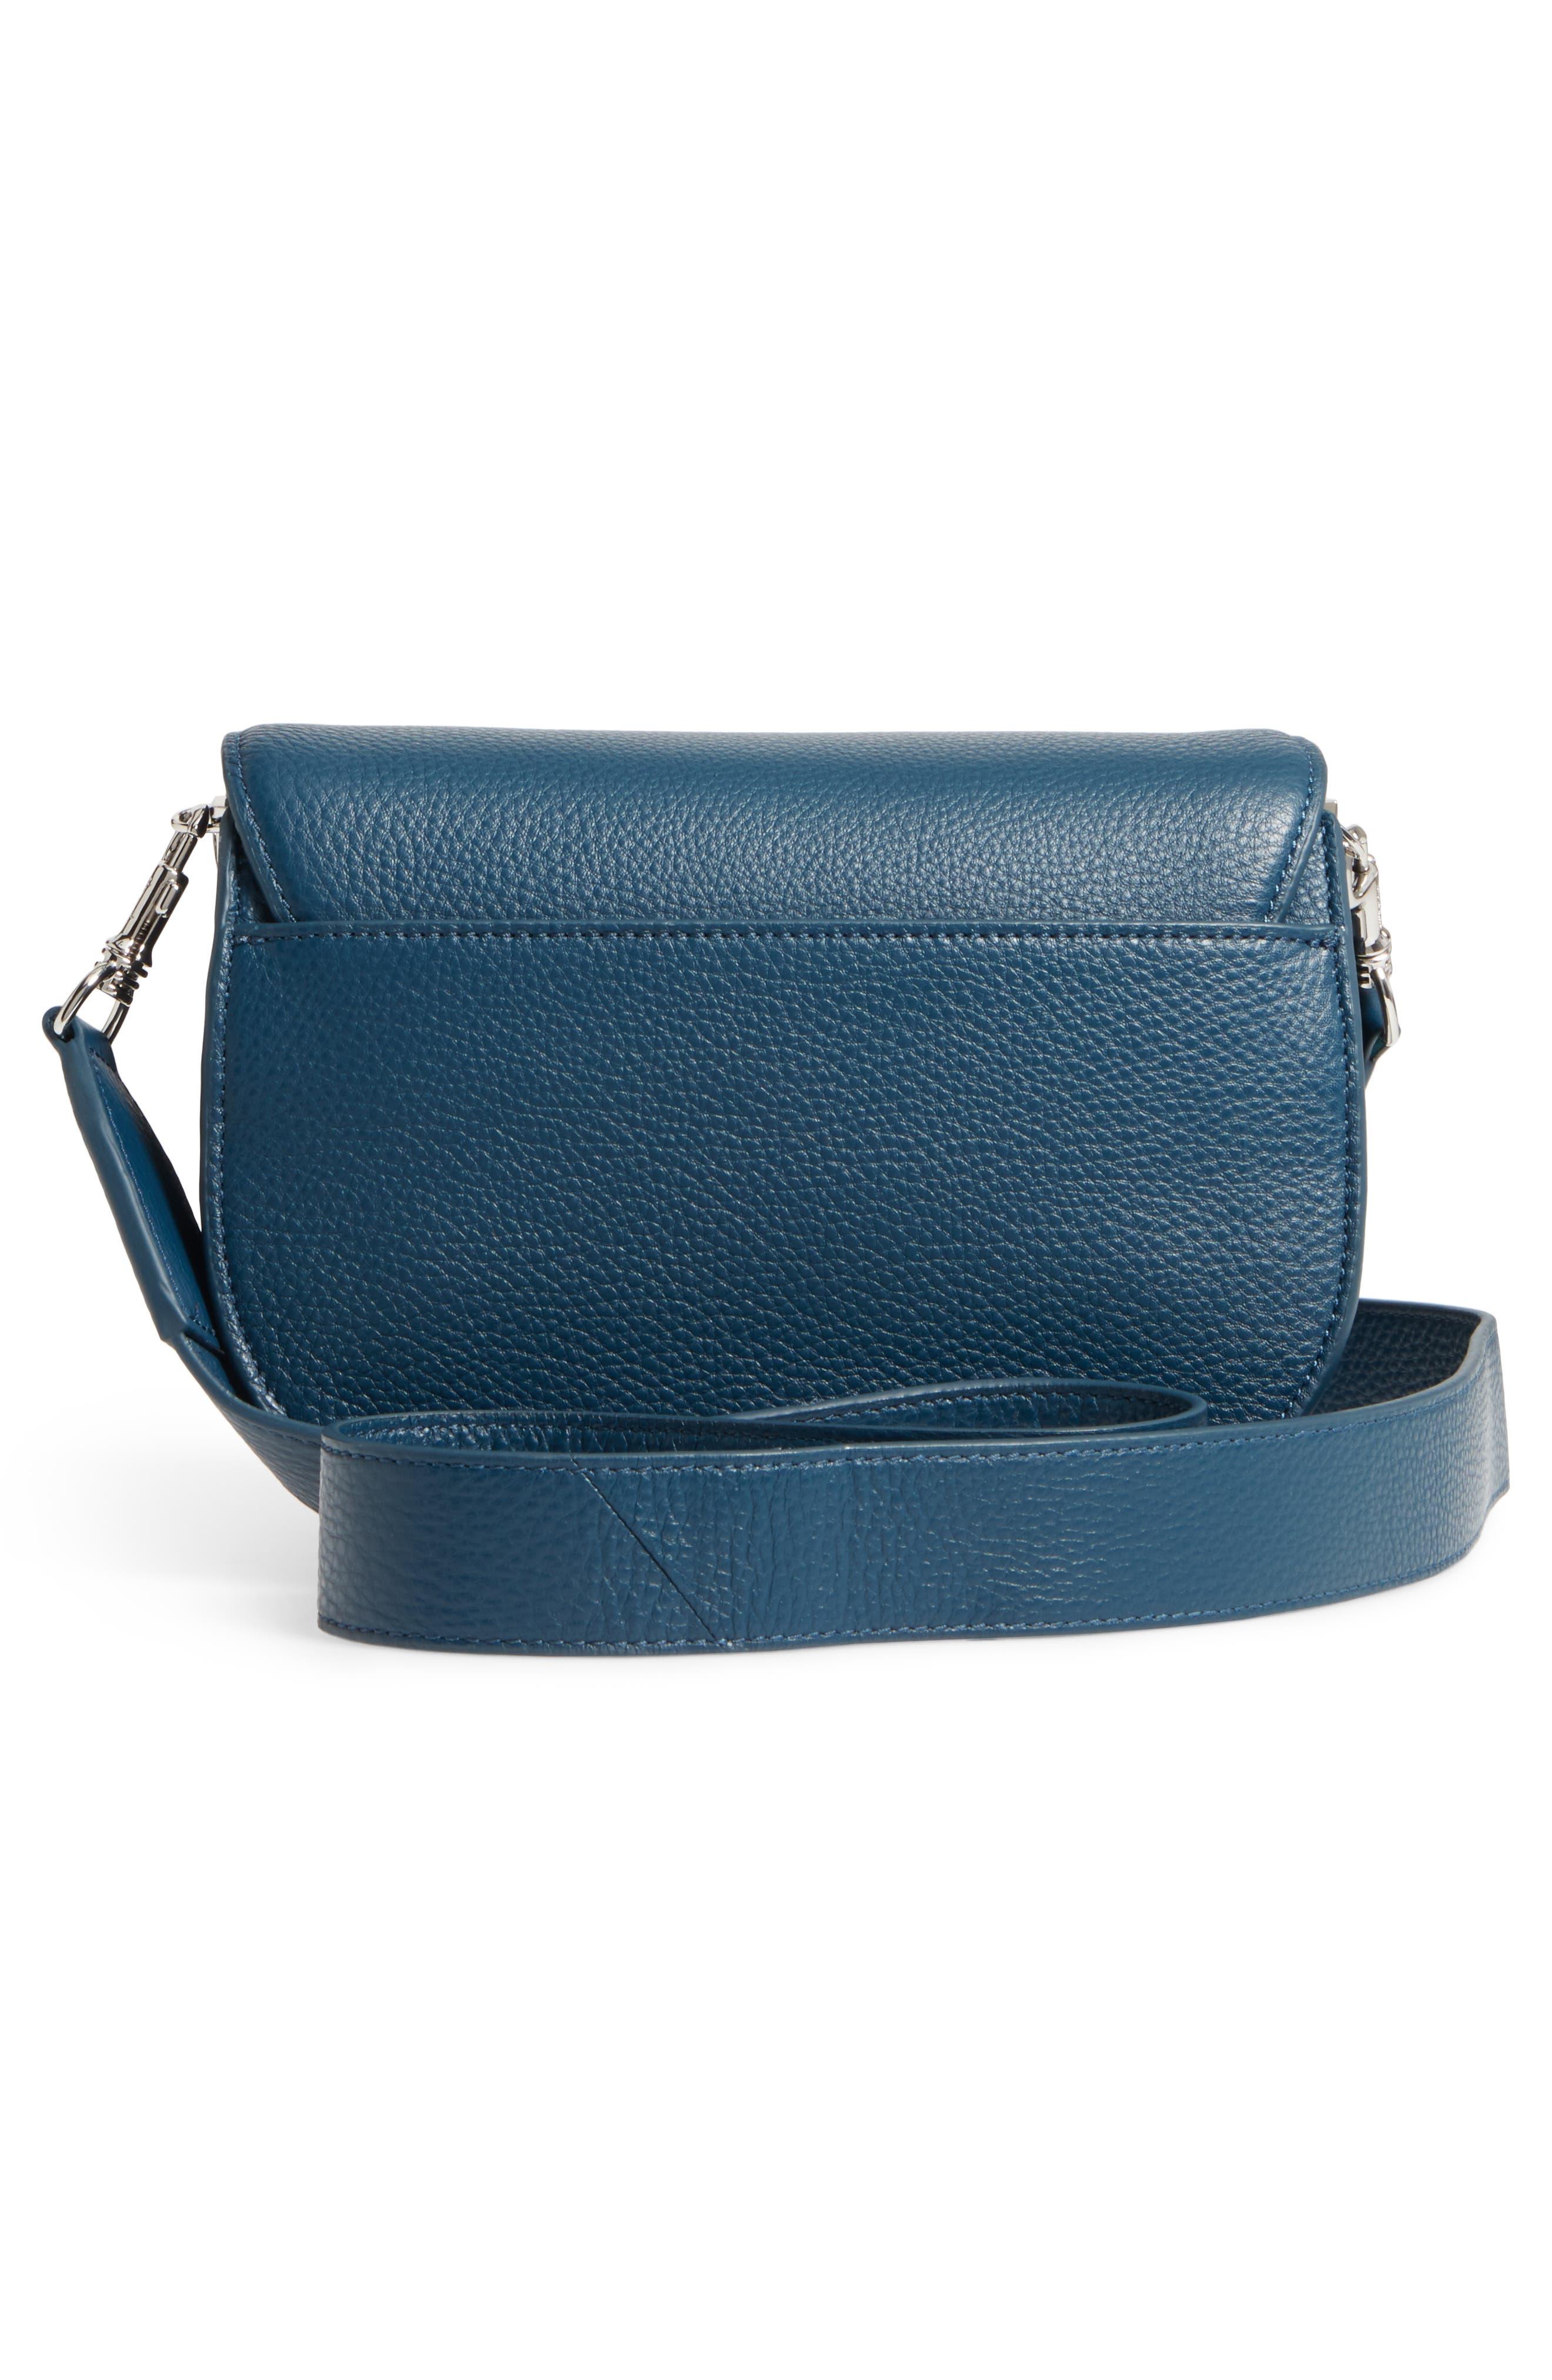 Landon Leather Crossbody Saddle Bag,                             Alternate thumbnail 10, color,